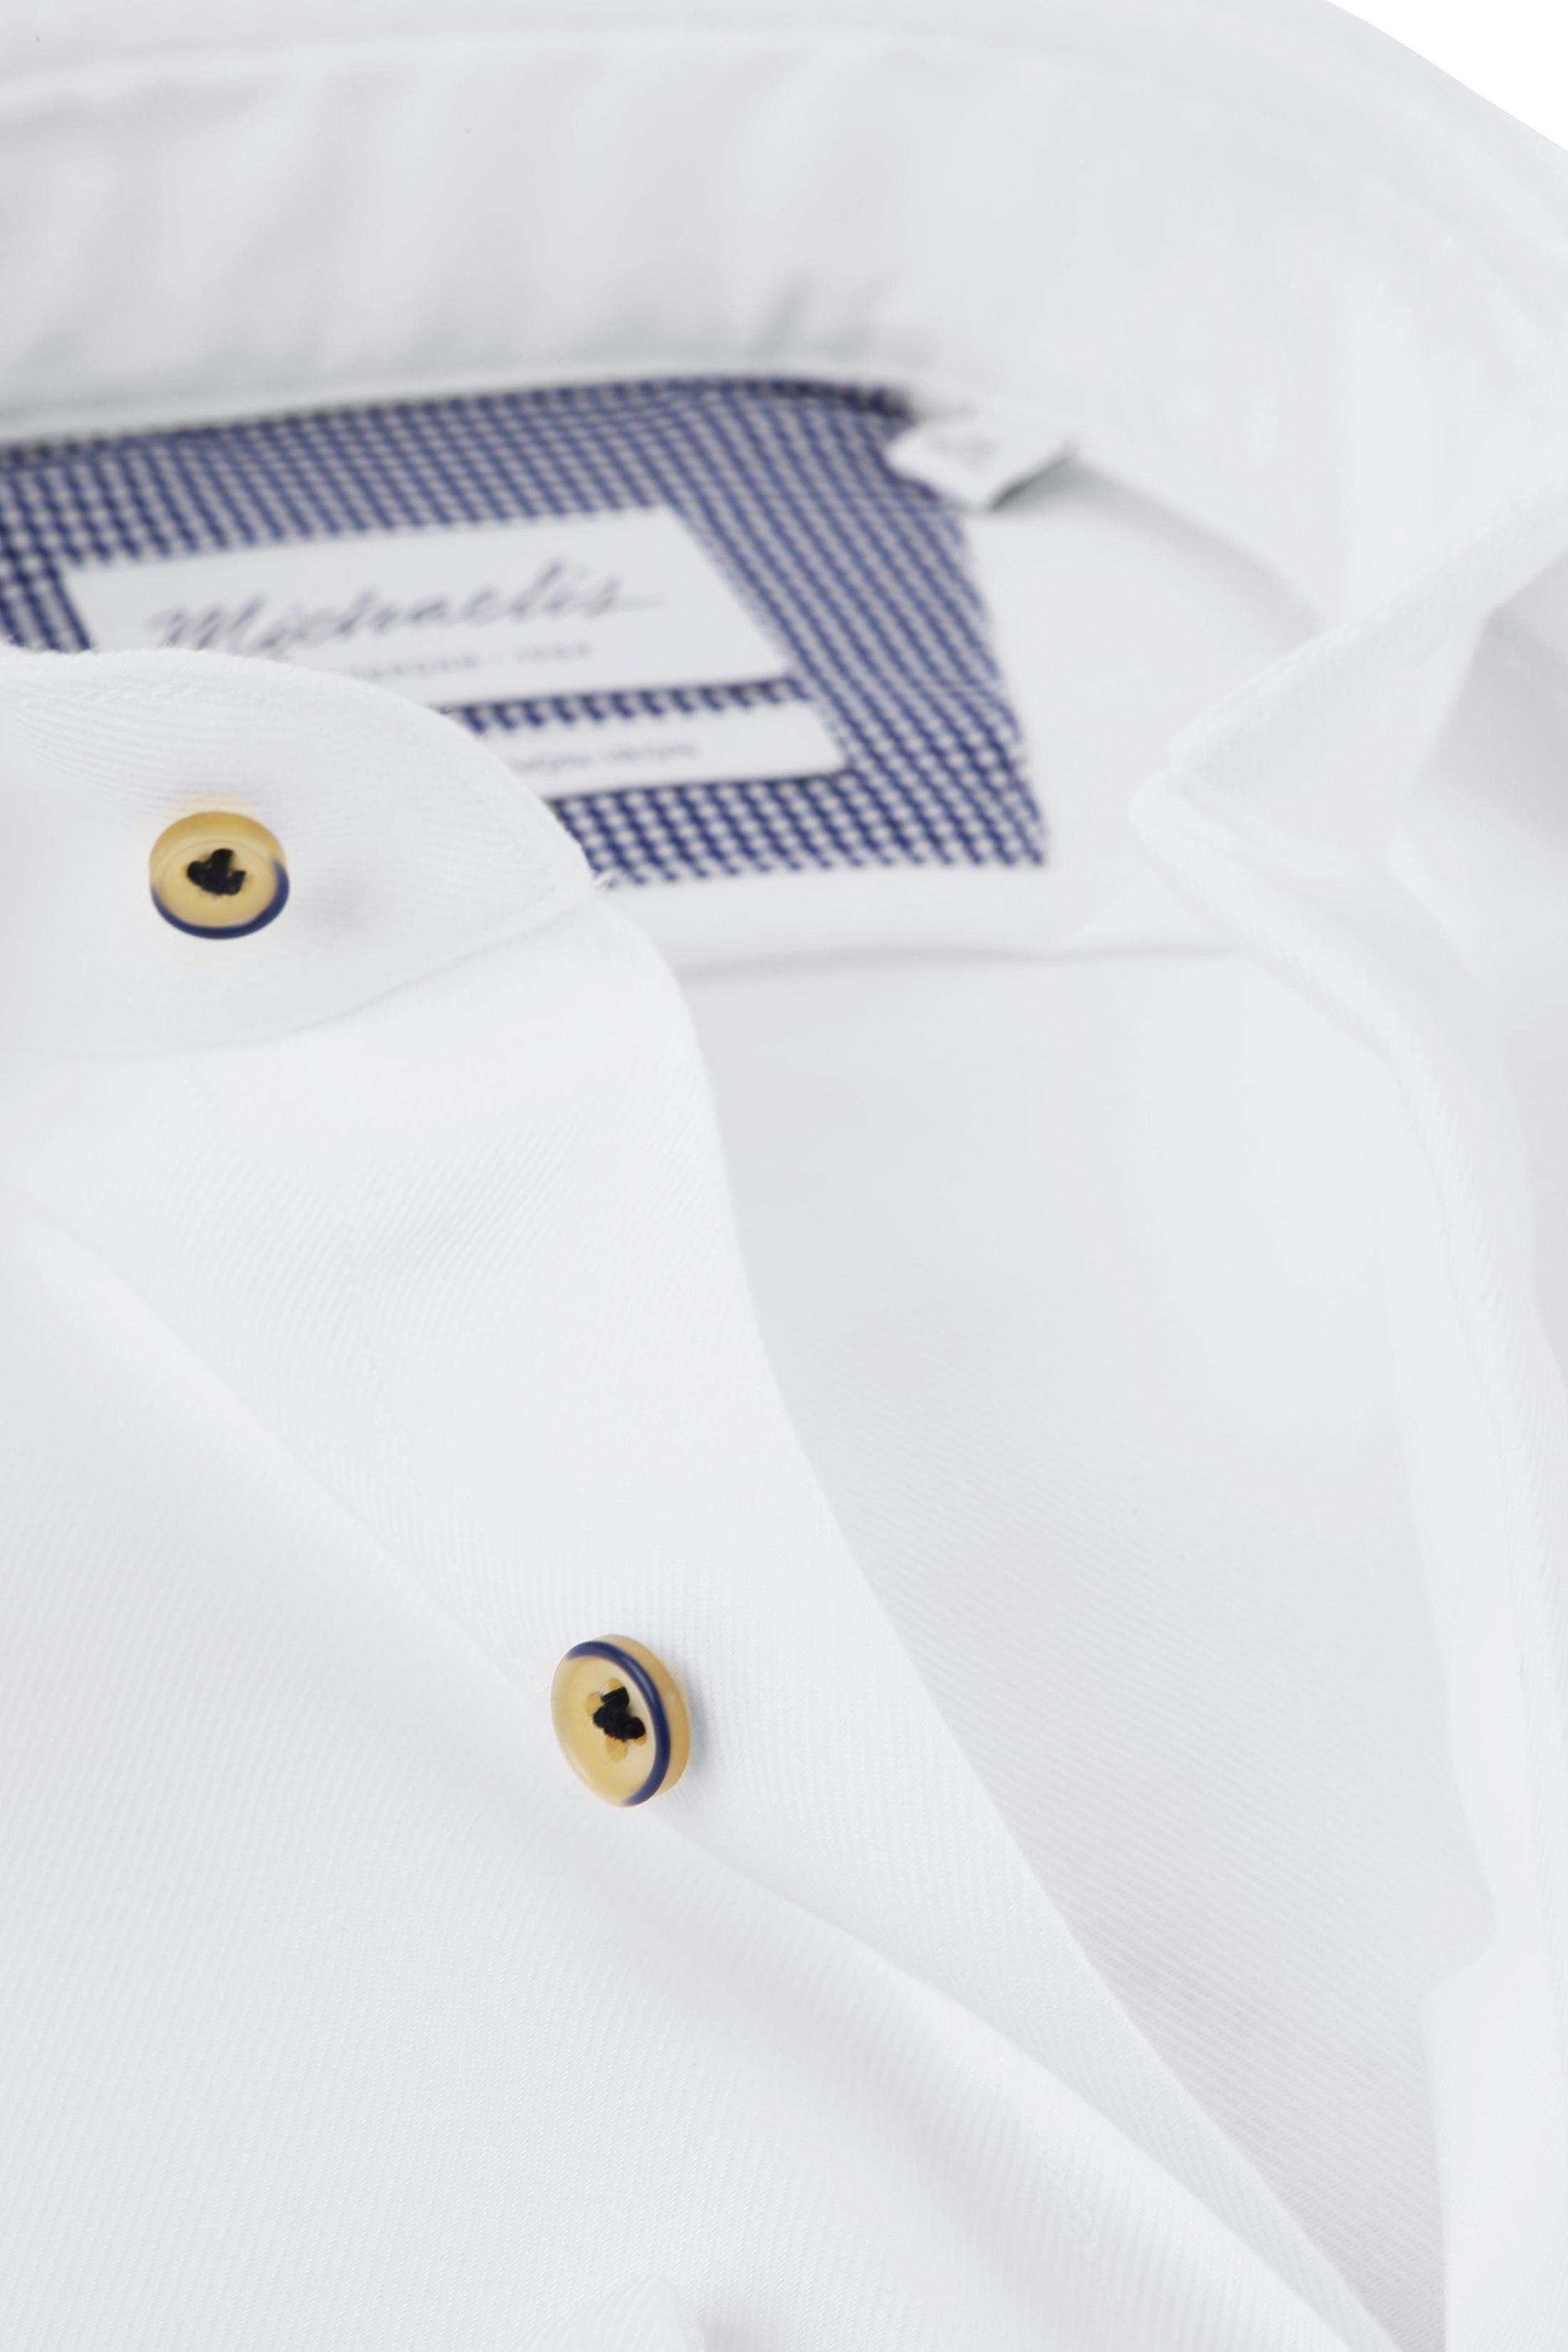 Michaelis Overhemd Twill Strijkvrij Wit foto 1